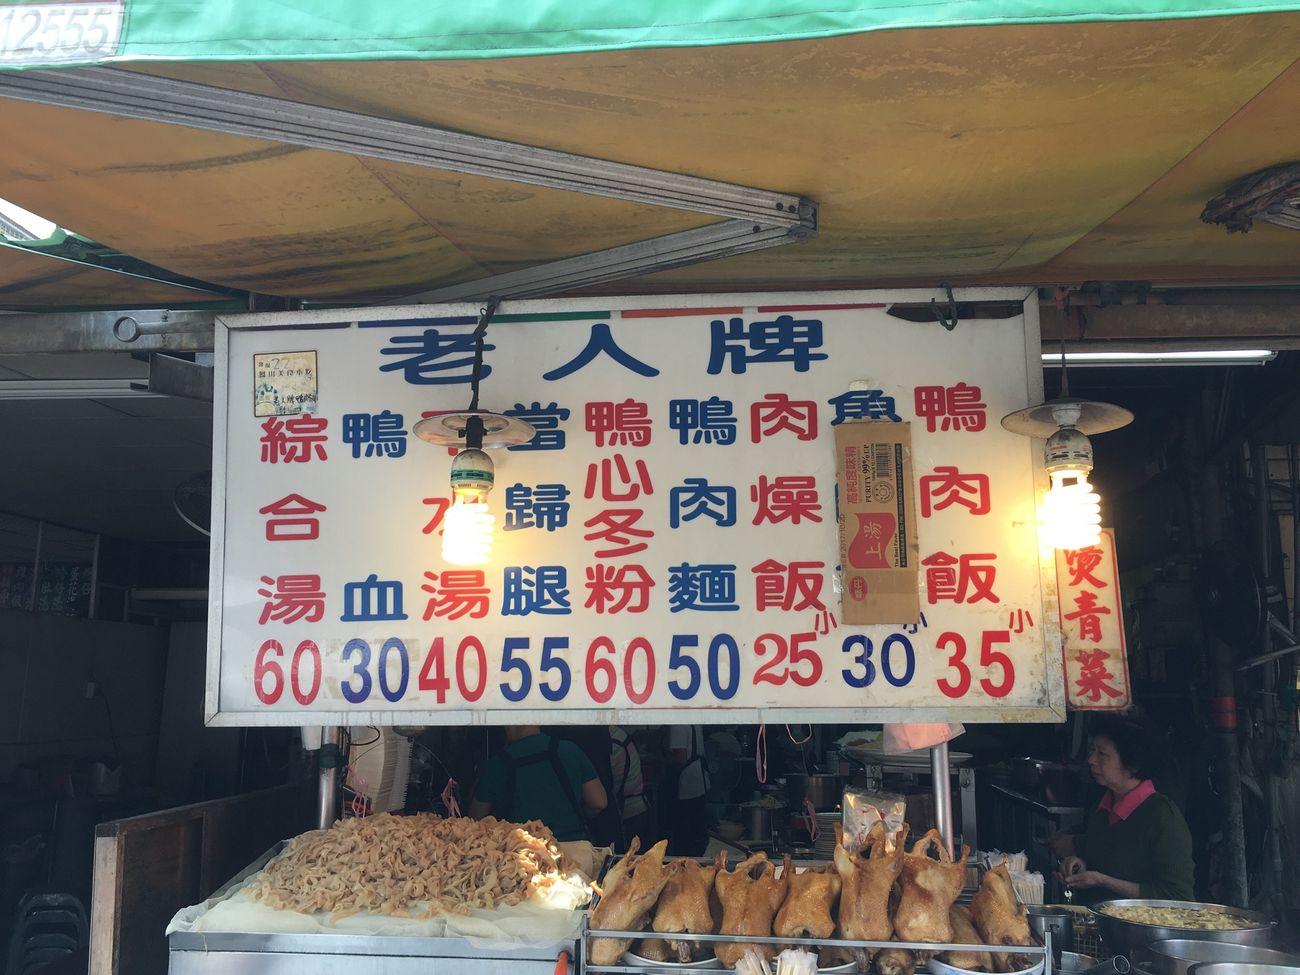 高雄 Kaohsiung 二月 臺灣 February Taiwan Lunch 午餐 小吃 Taiwanese